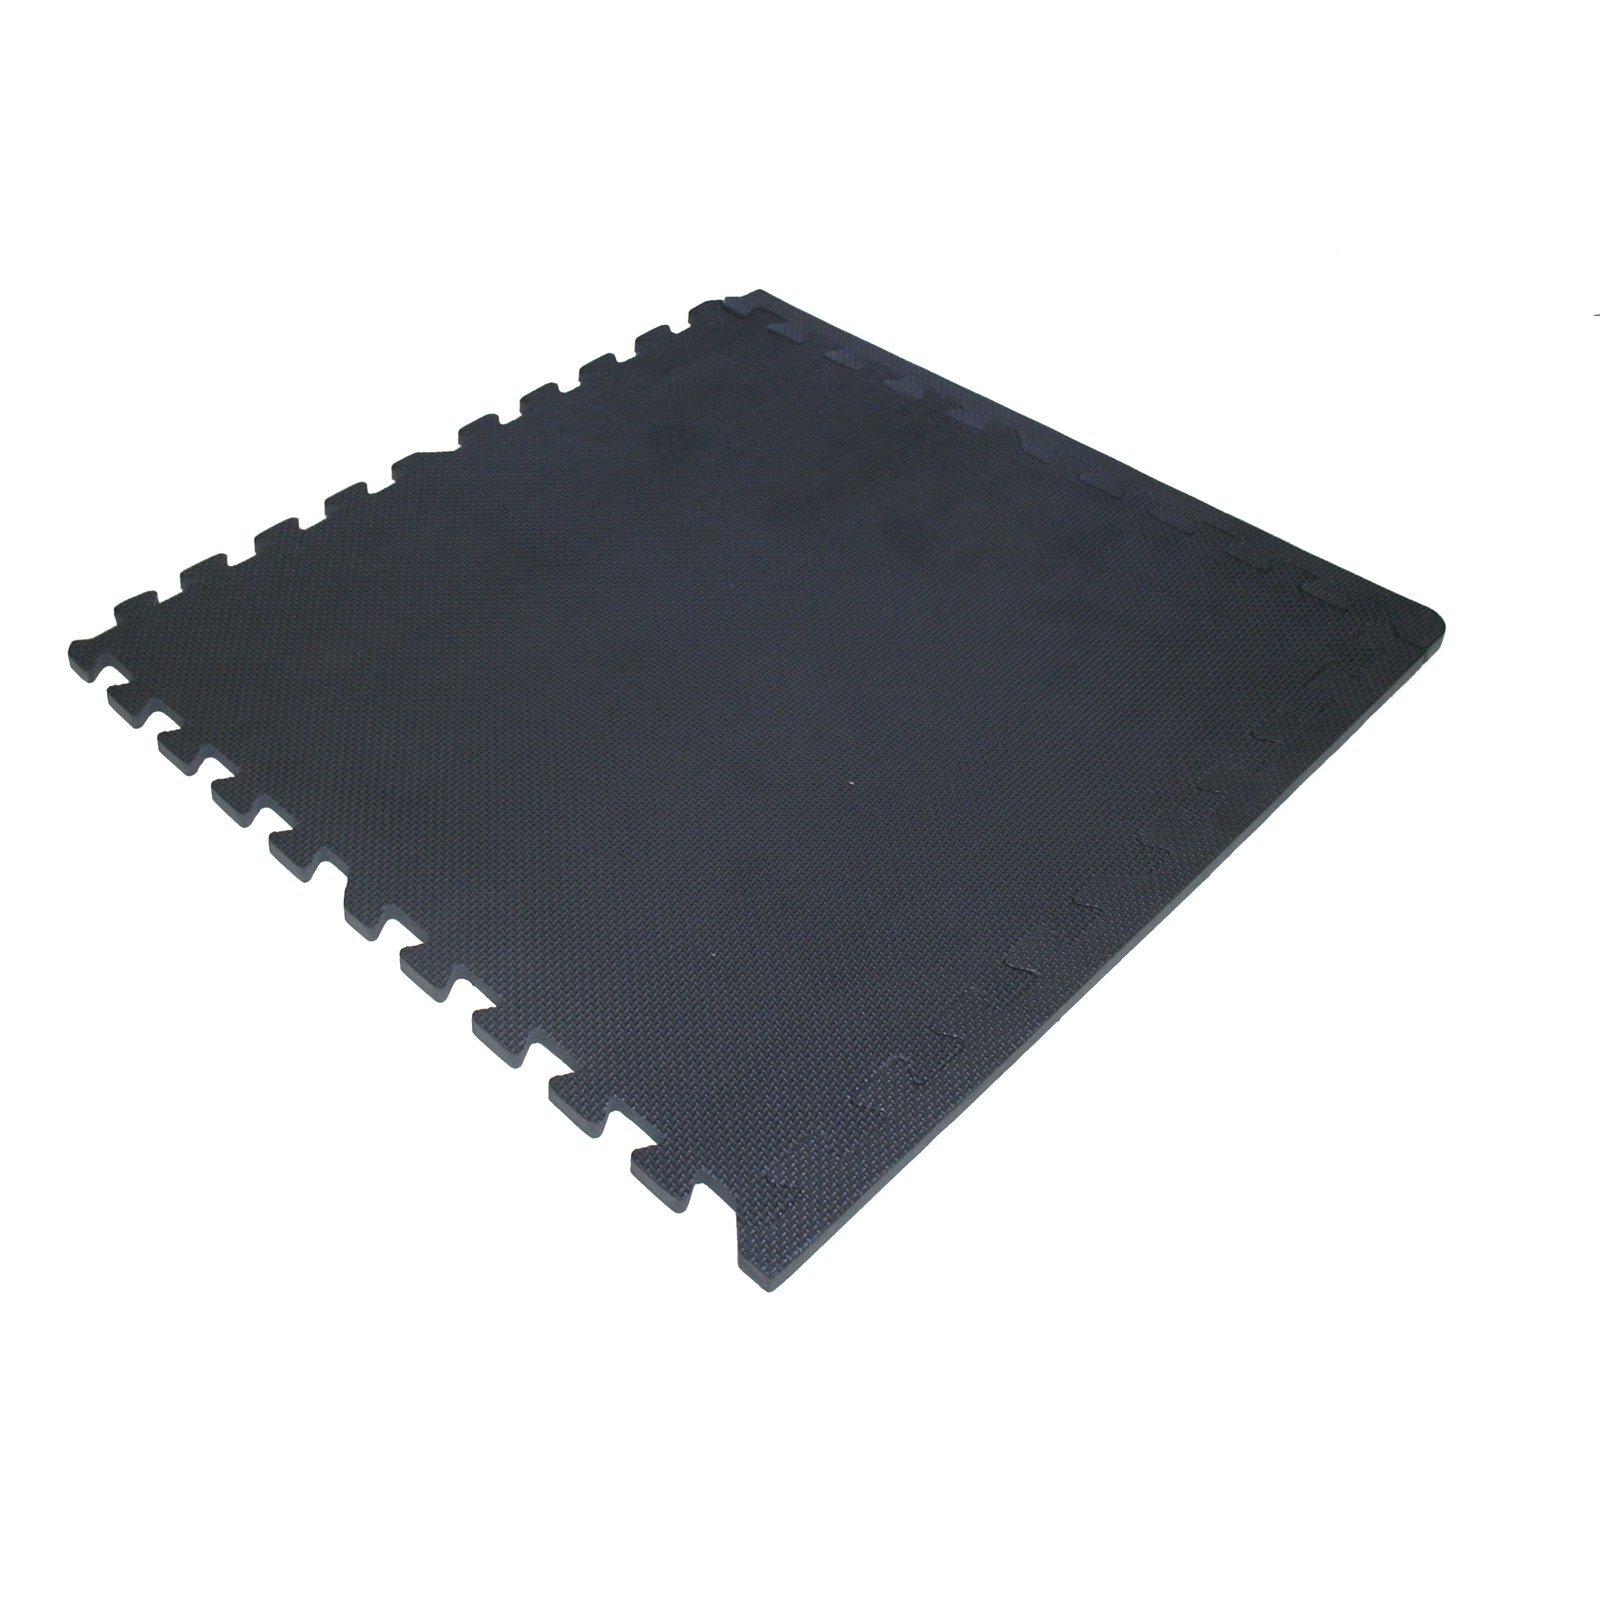 EVA 50 x 50cm Interlock Foam Mats Solid Black Pk4